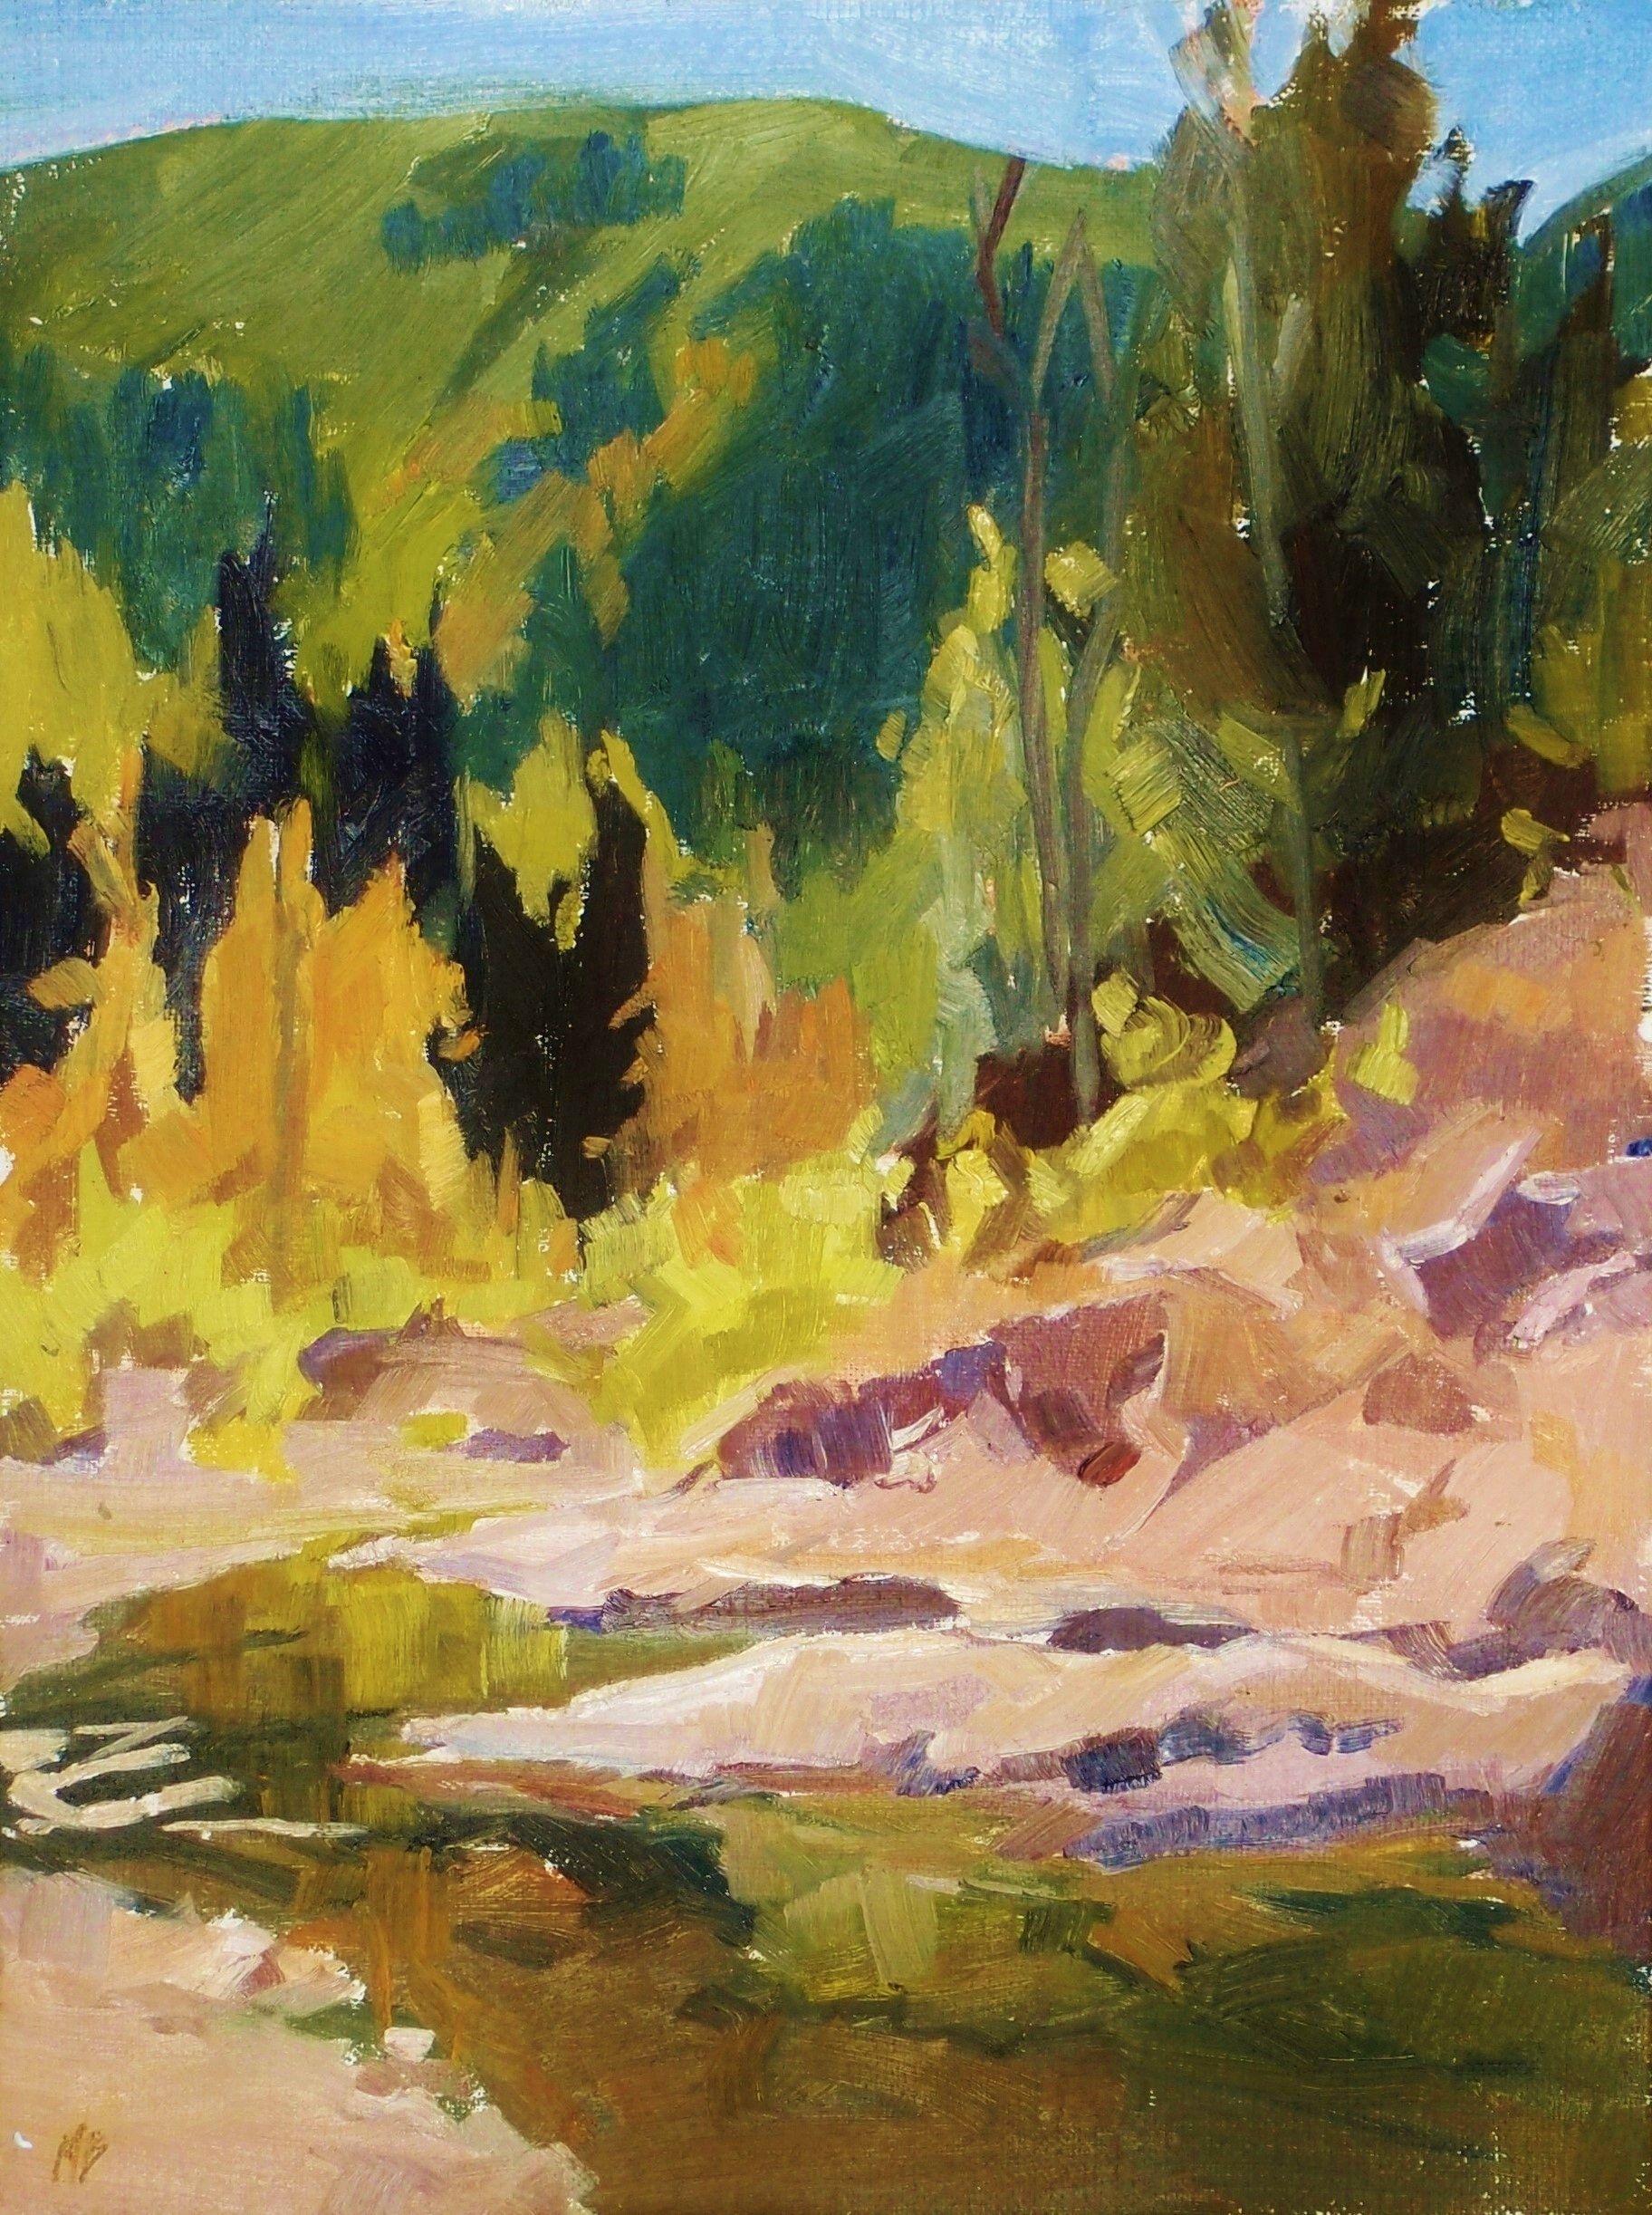 Liquid Calm, Painting, Oil on MDF Panel